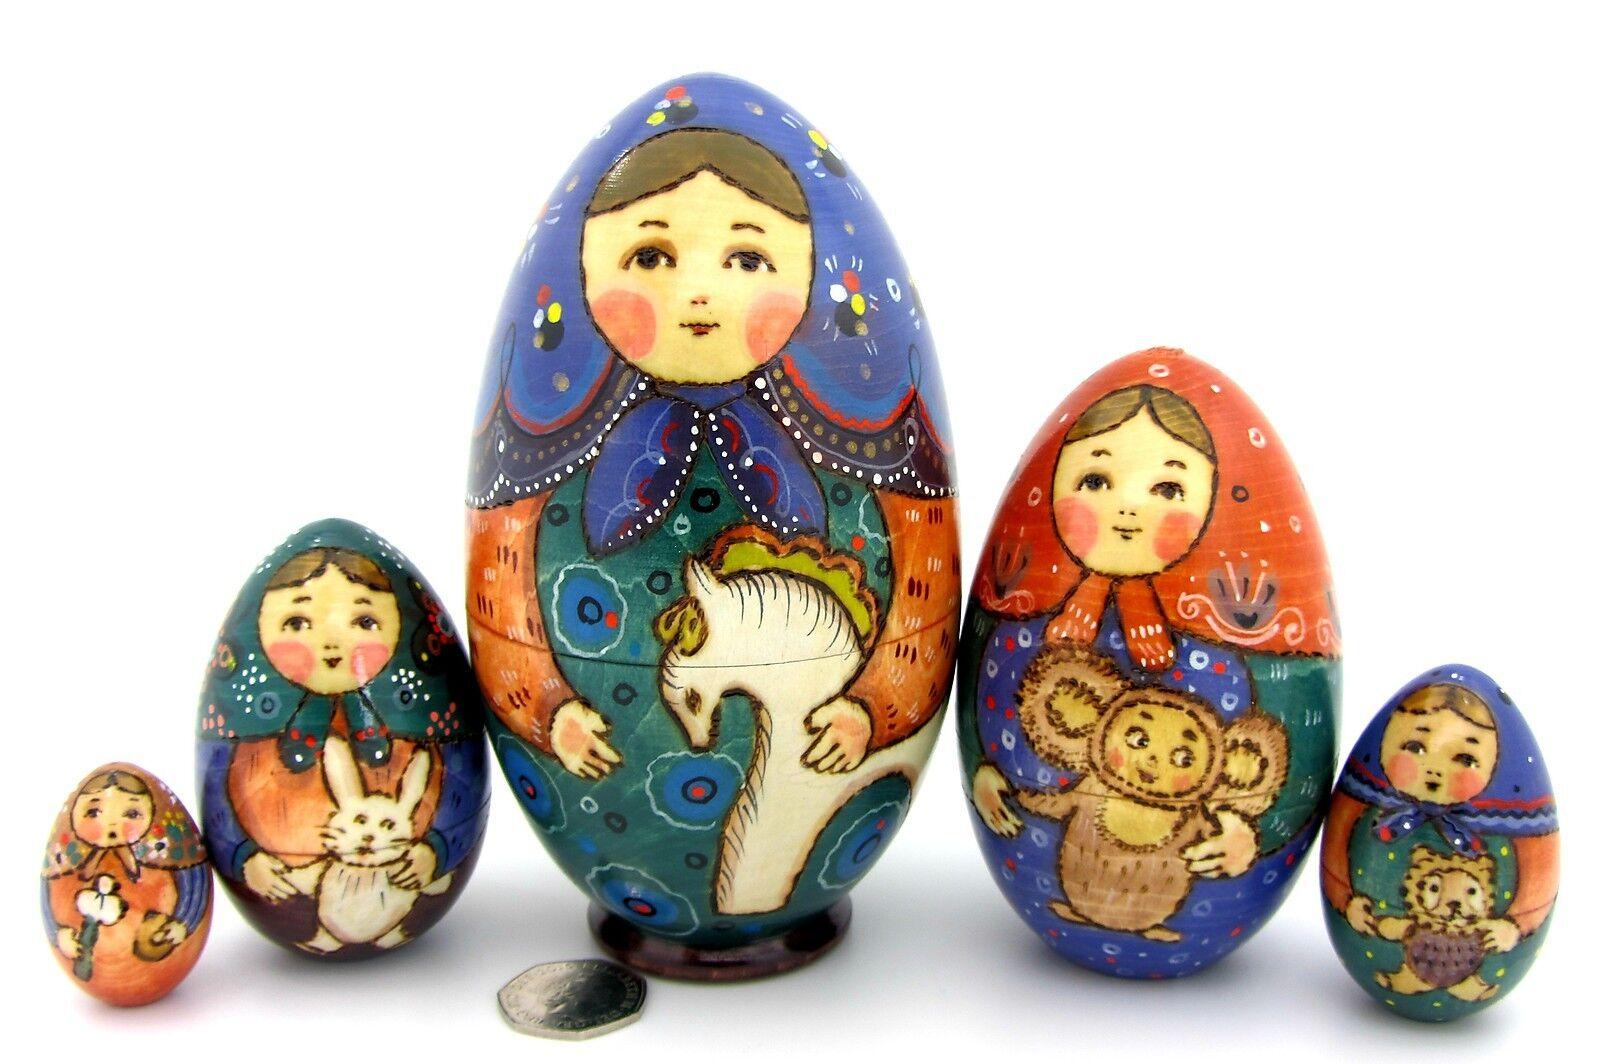 Muñecas-caja Rusas Matrioska Babushka 5 Pintado a mano Huevo TEDDY juguetes